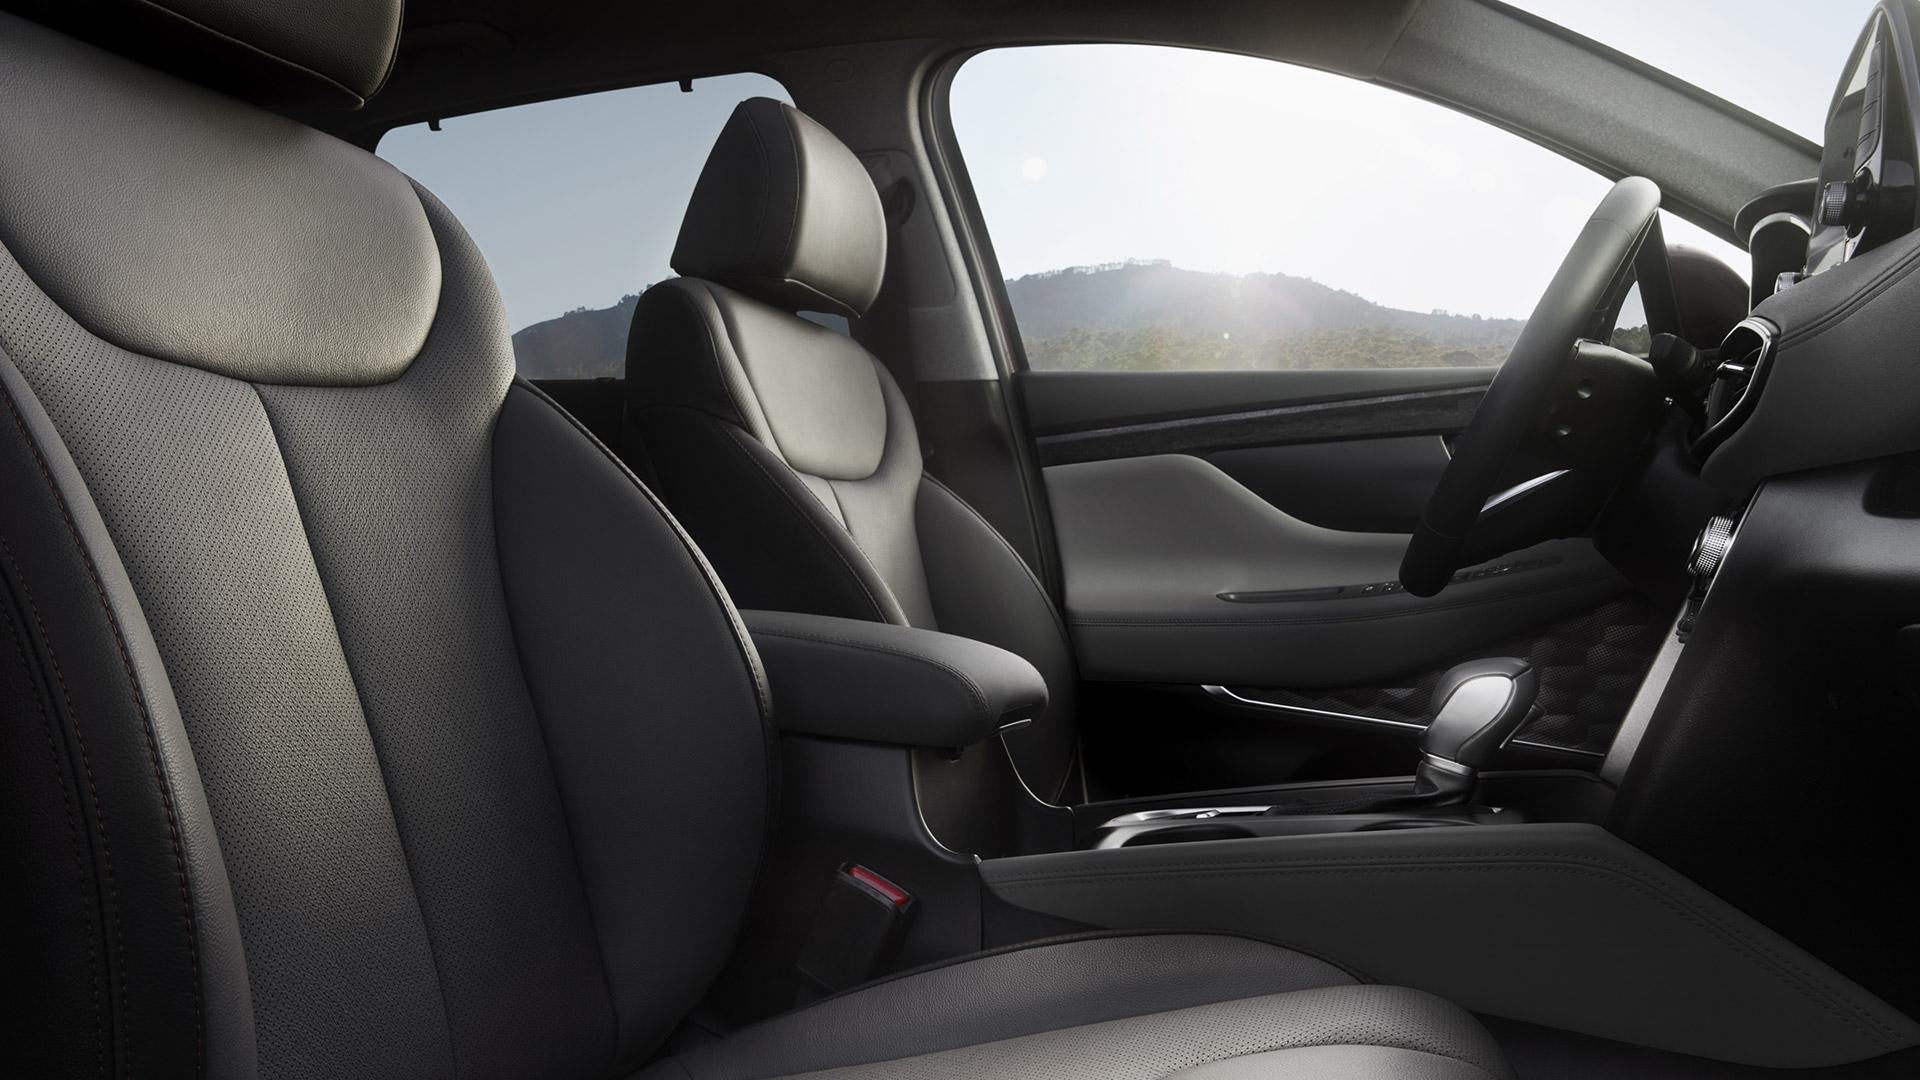 Test drive your Hyundai